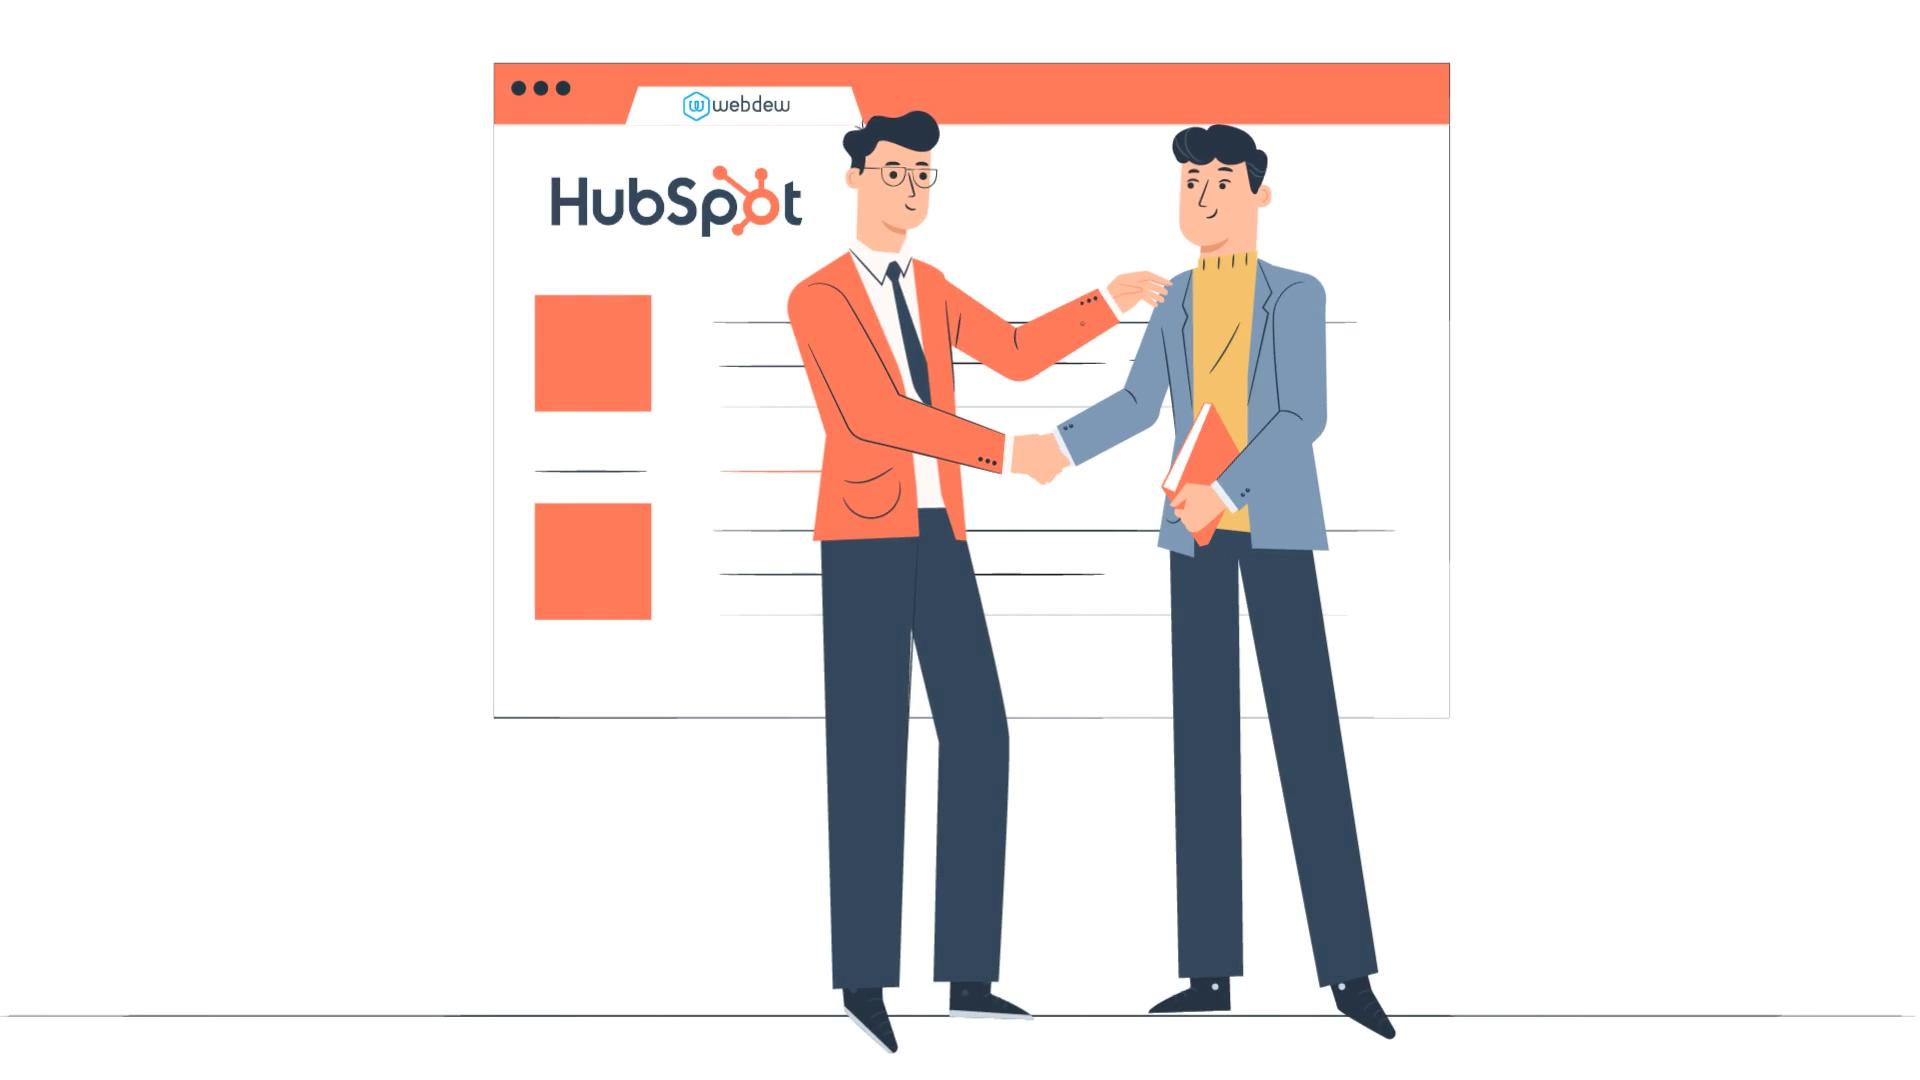 webdew HubSpot Migration storyboard